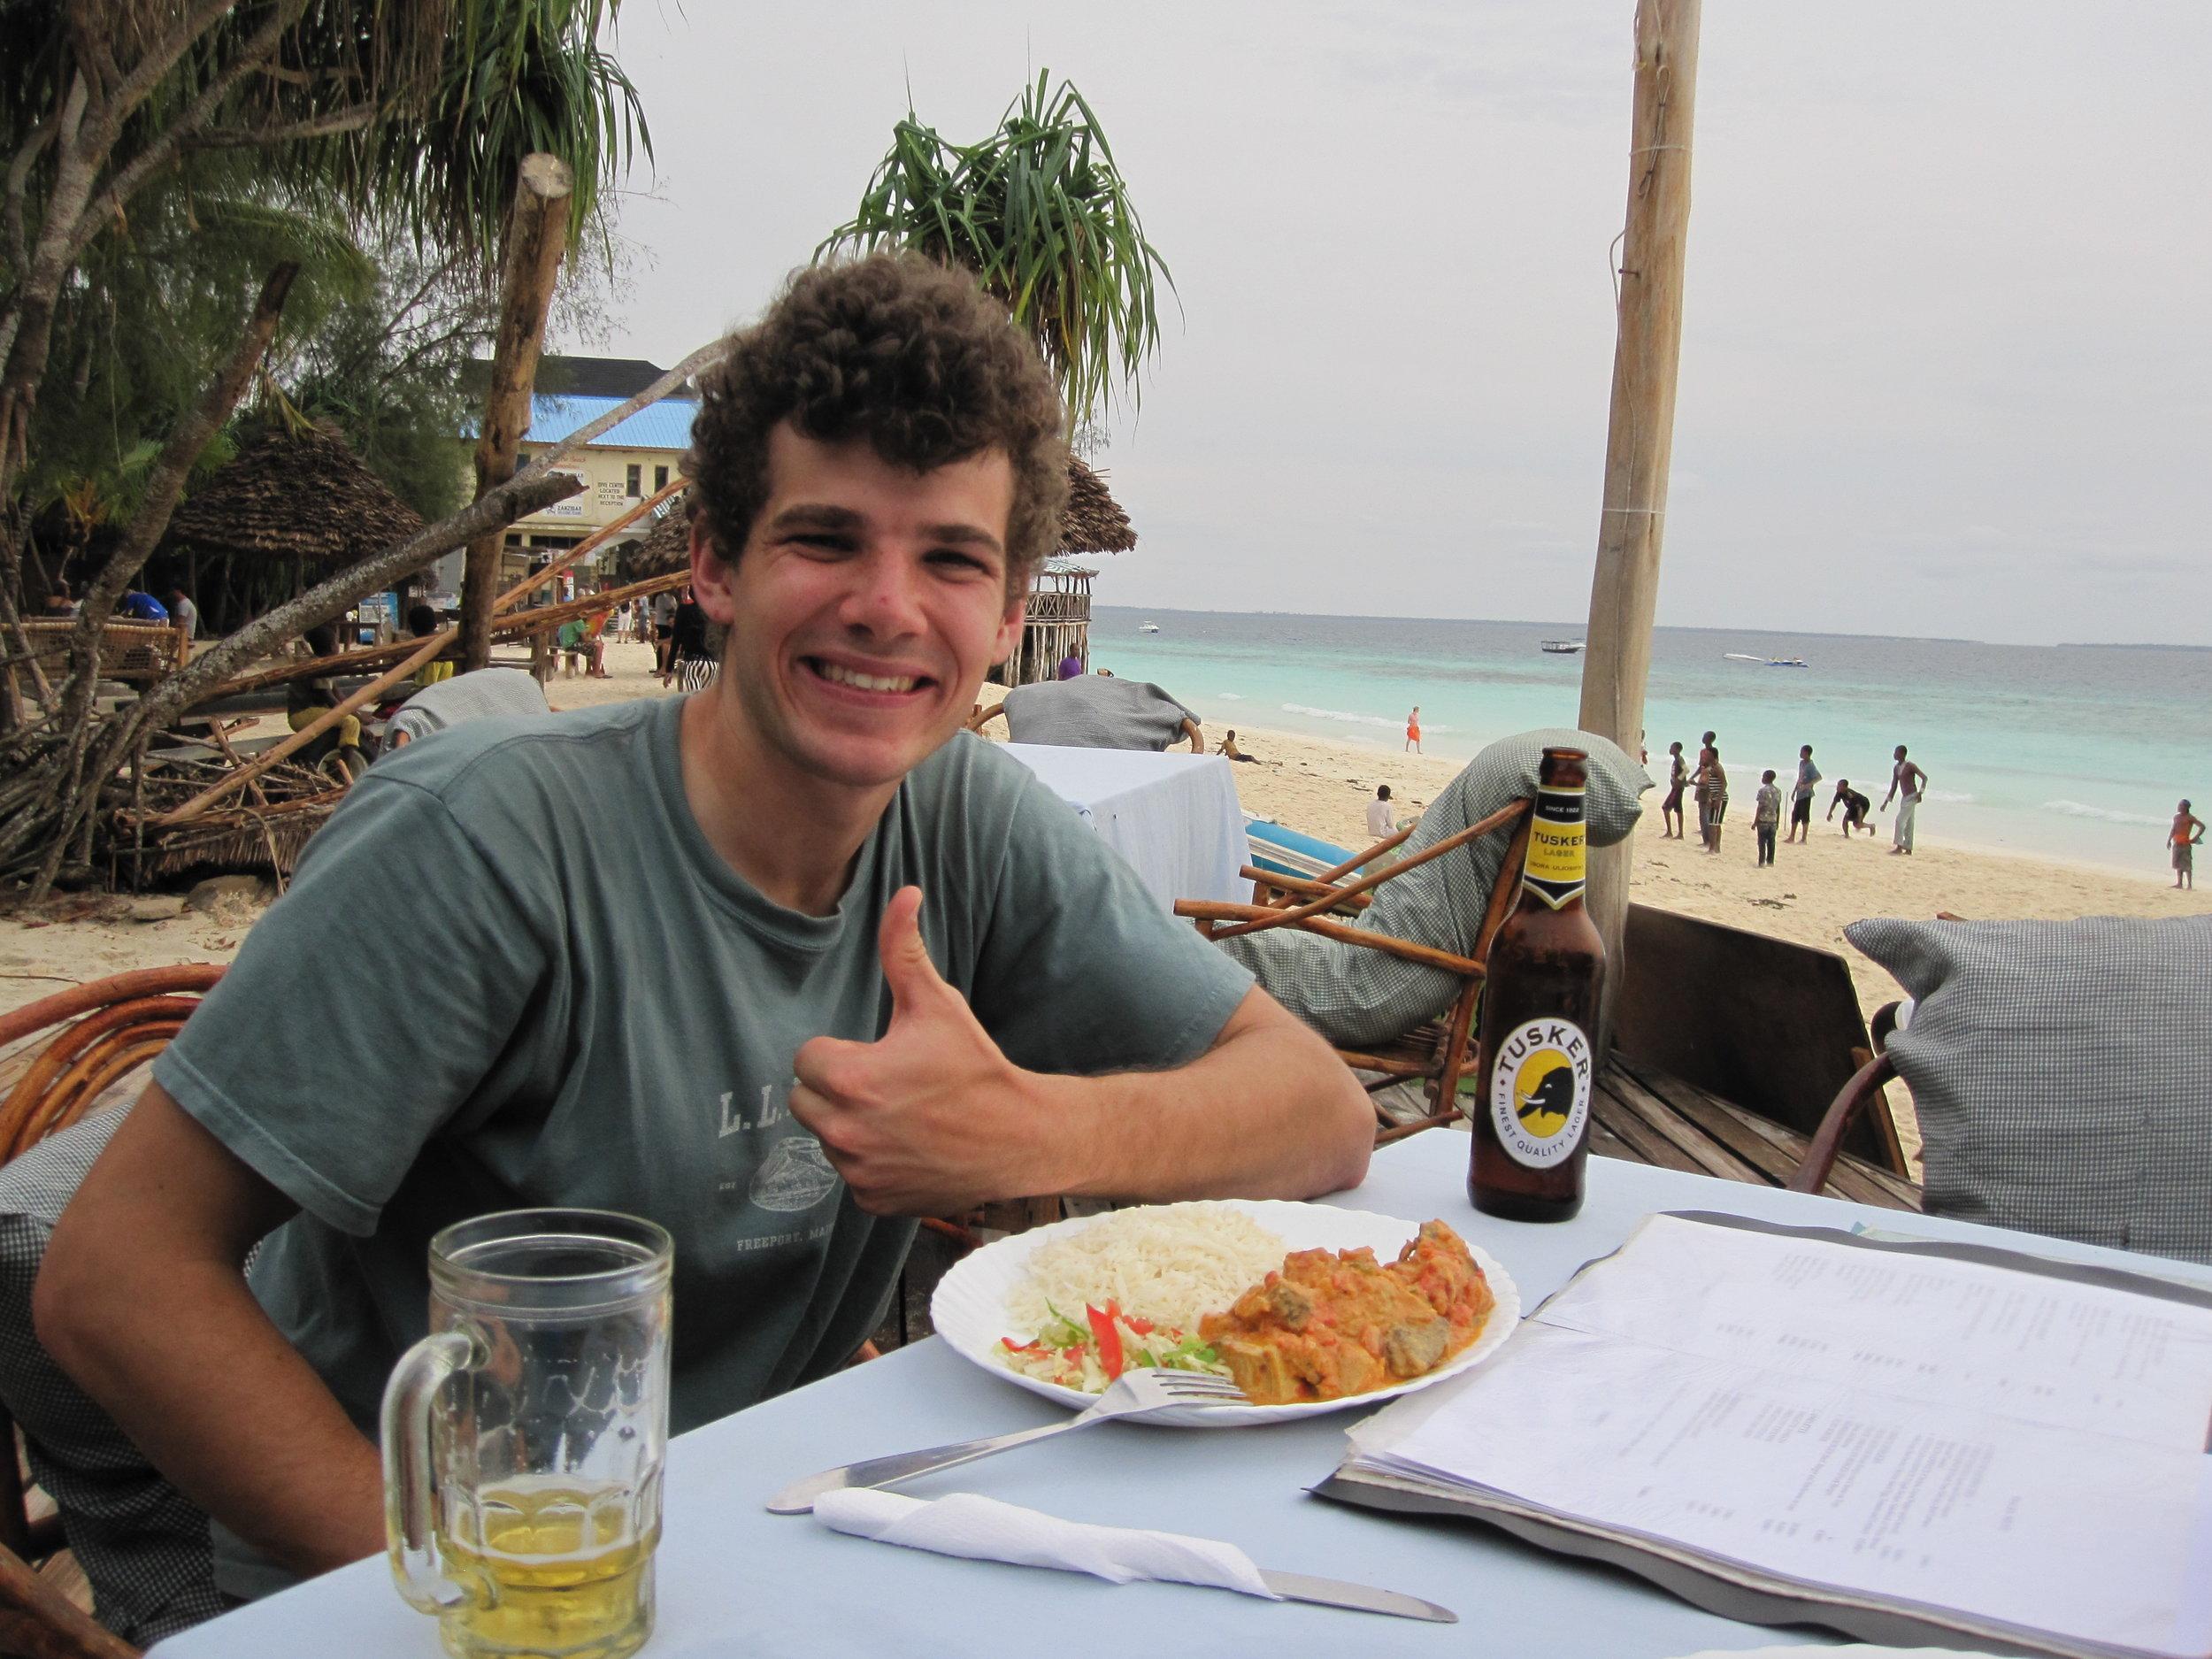 Dinner on the beach in Nungwi, Zanzibar